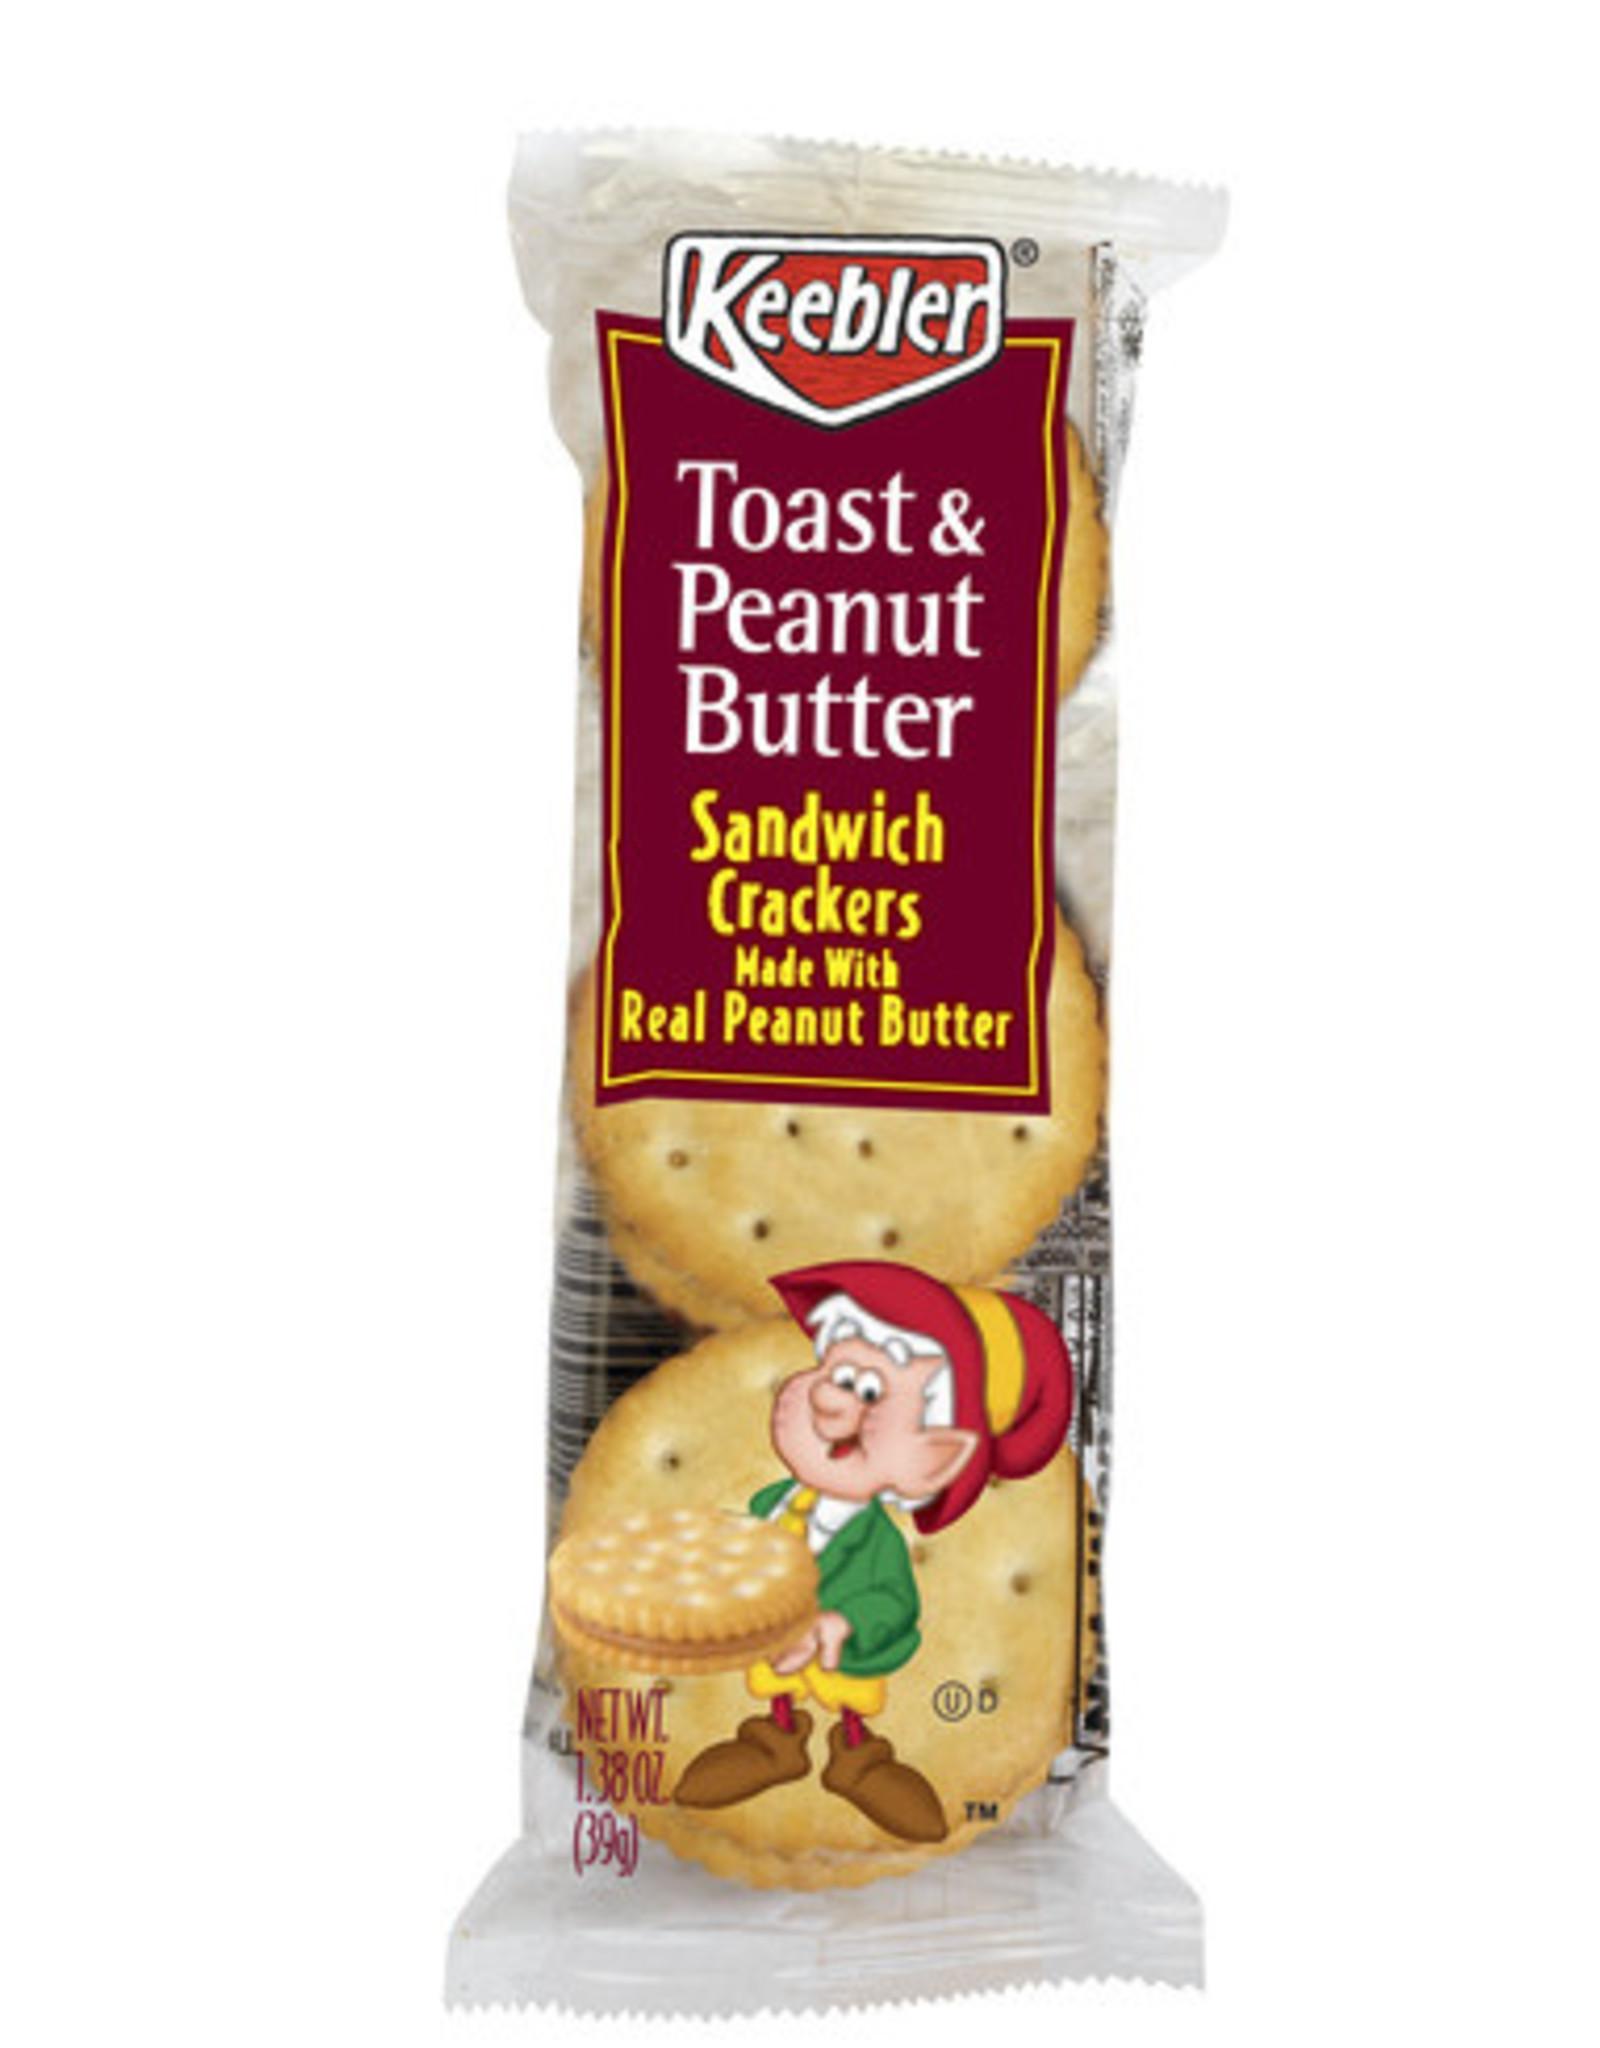 Keebler peanut butter crackers